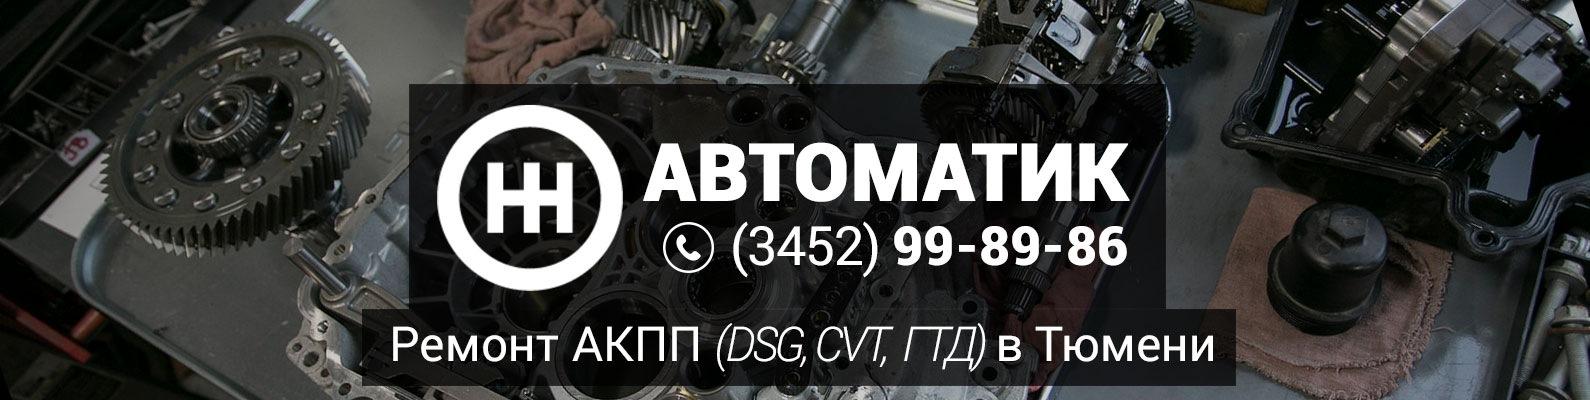 Автоматик: ремонт АКПП в Тюмени | ВКонтакте